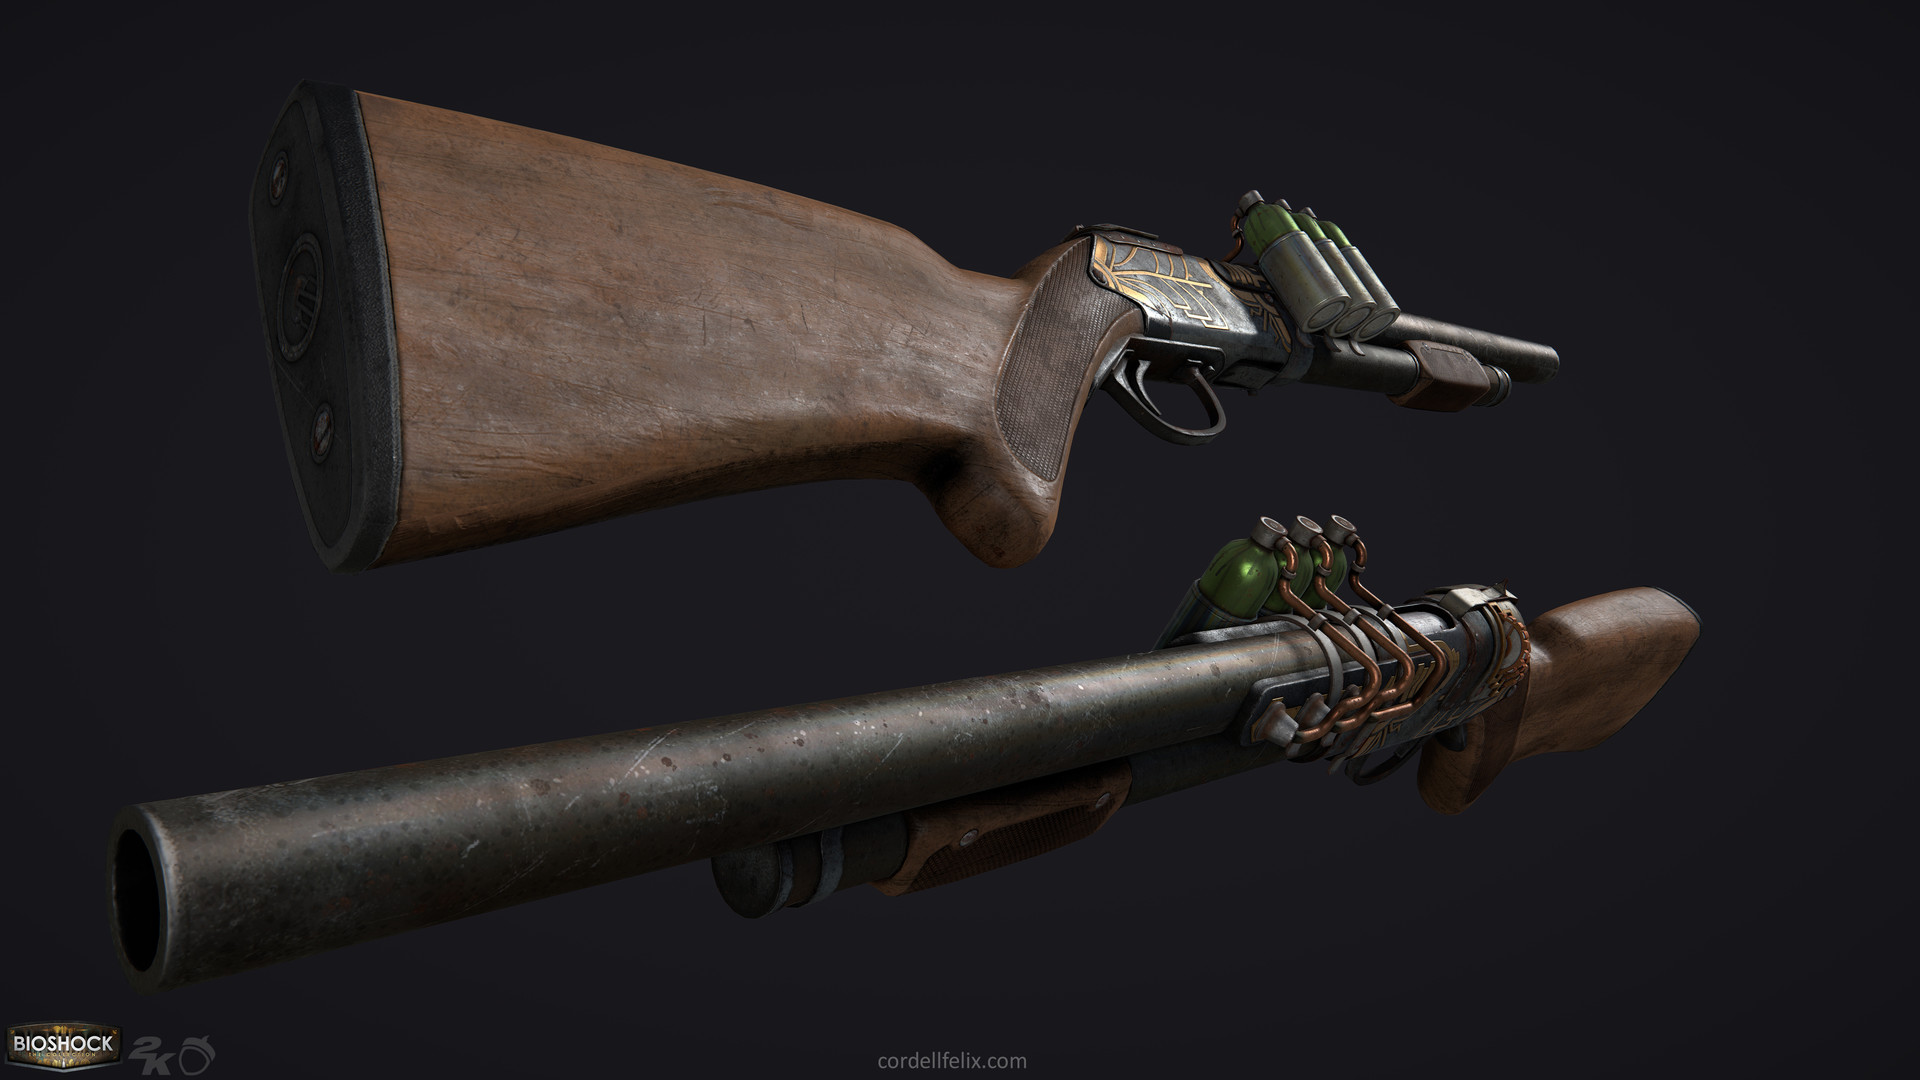 Cordell felix cordellfelix shotgun 05